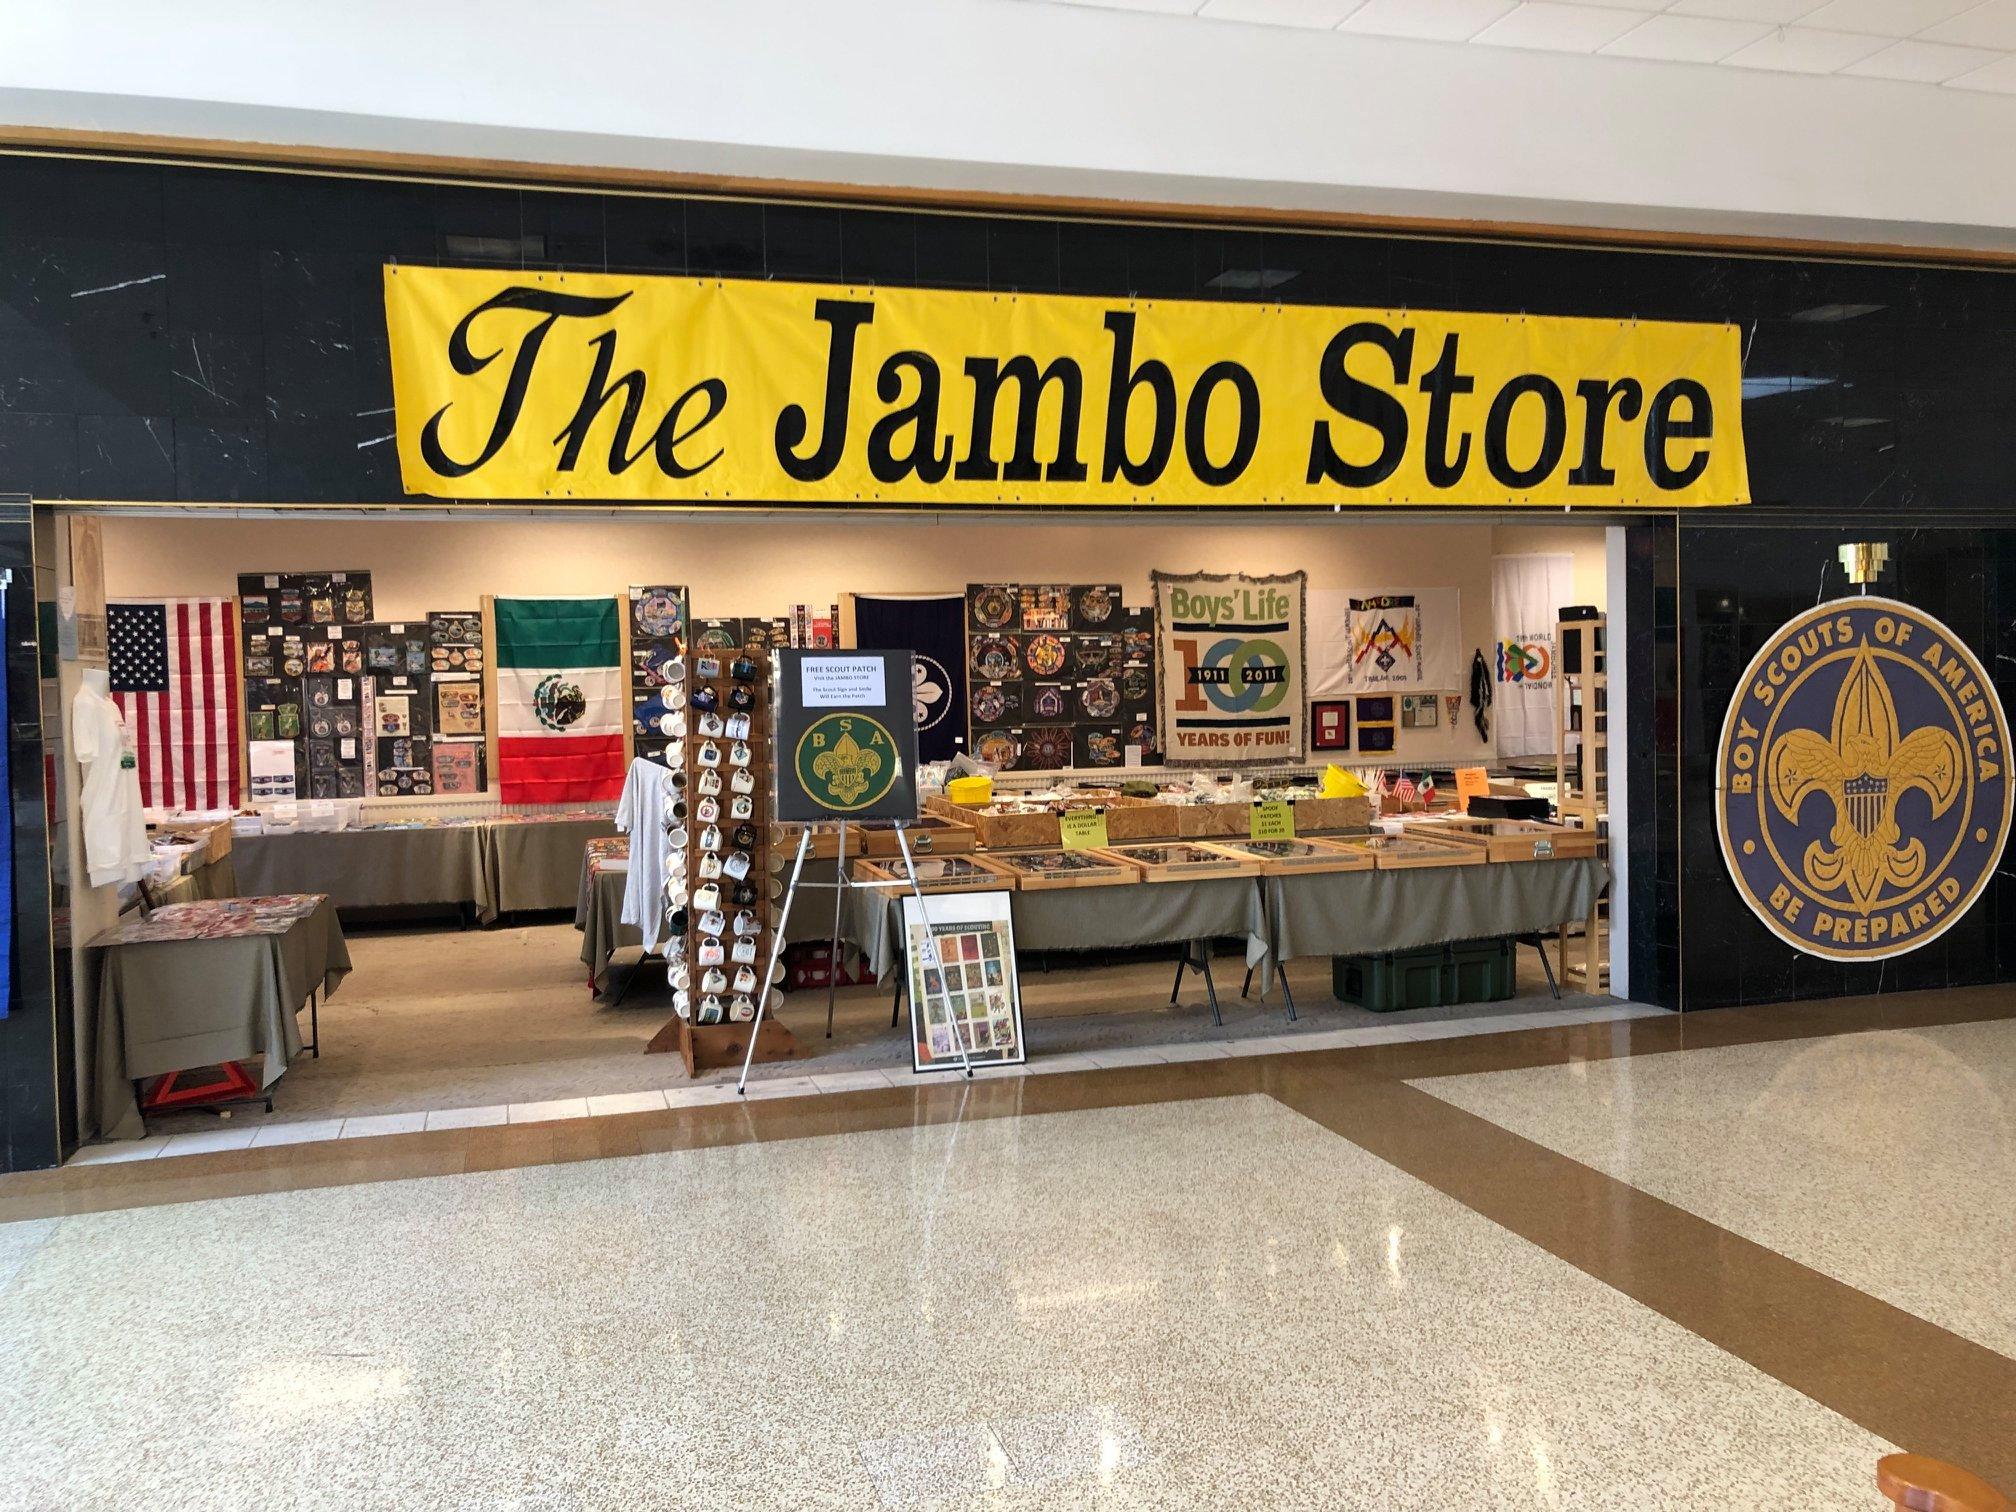 World Jamboree Store - Boy Scout Trade-O-Ree Calendar